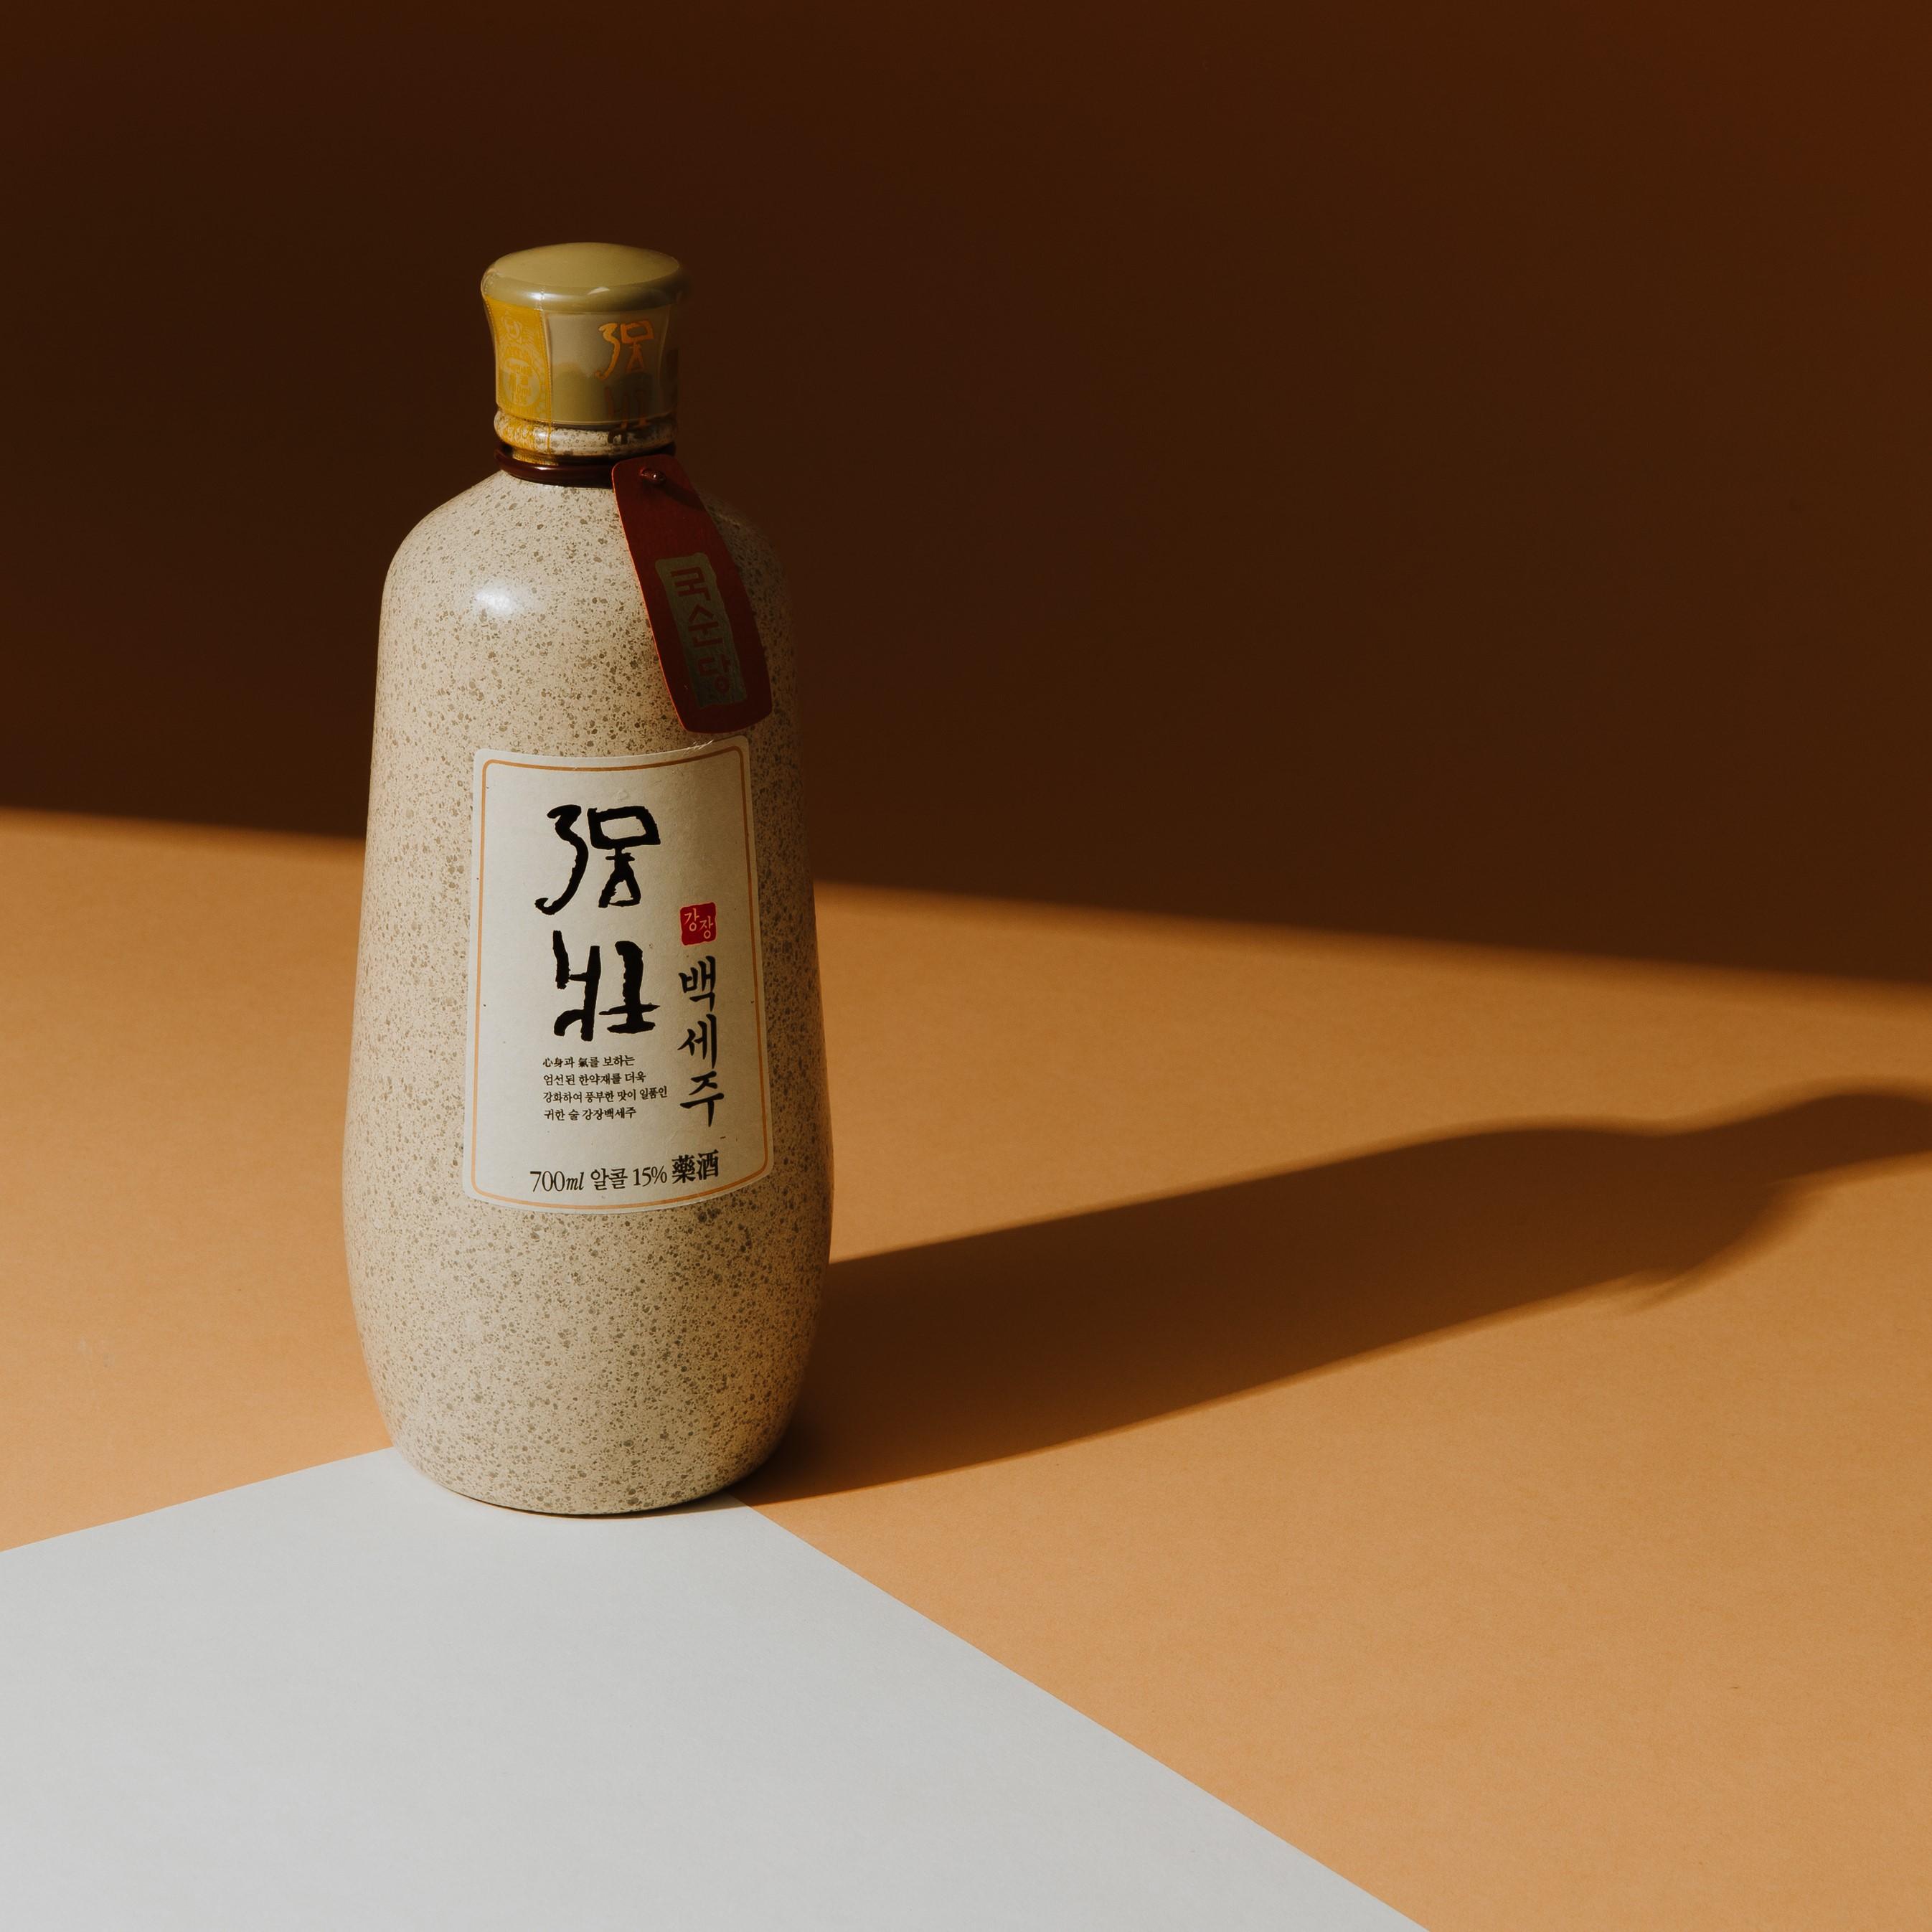 cute bottle of soju shown on a wooden tabletop